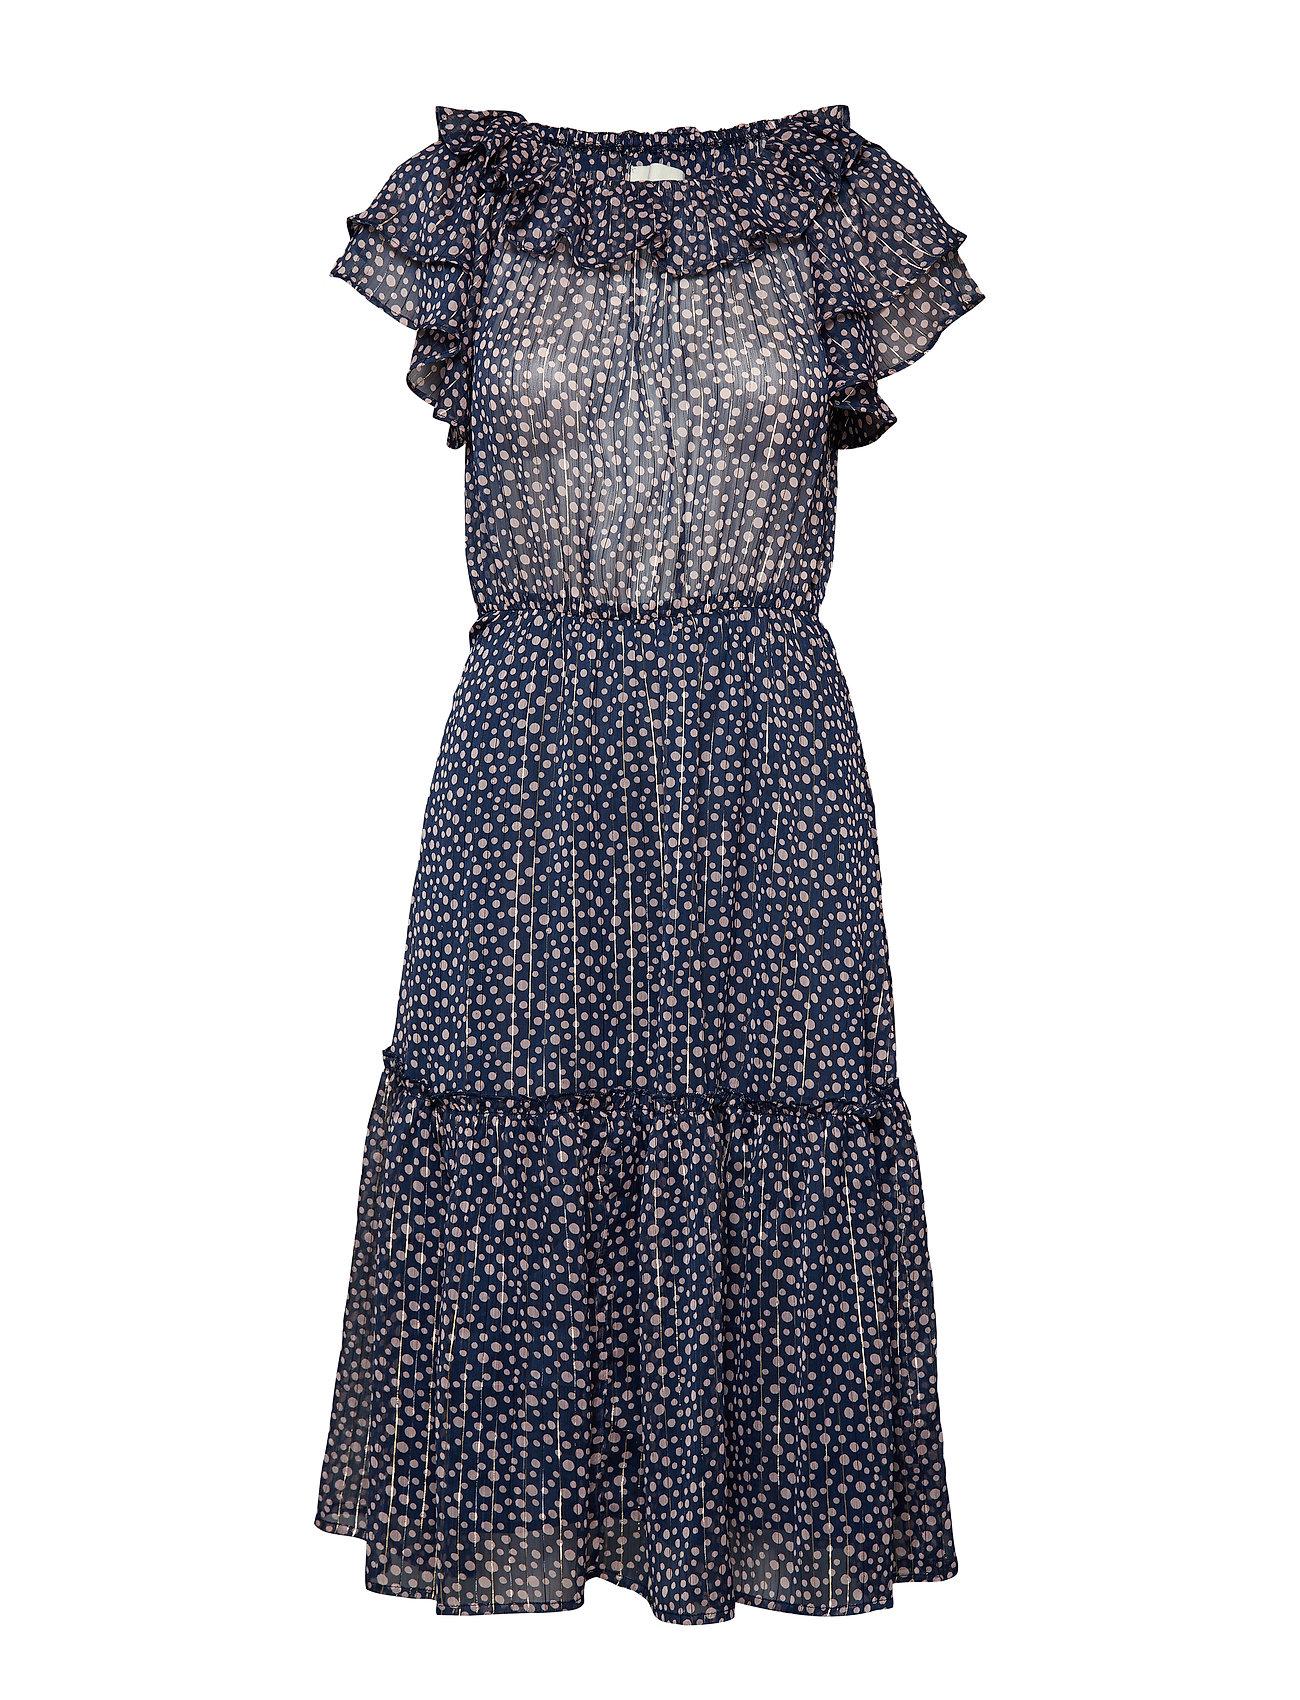 Lollys Laundry Veronica Dress - DOT PRINT